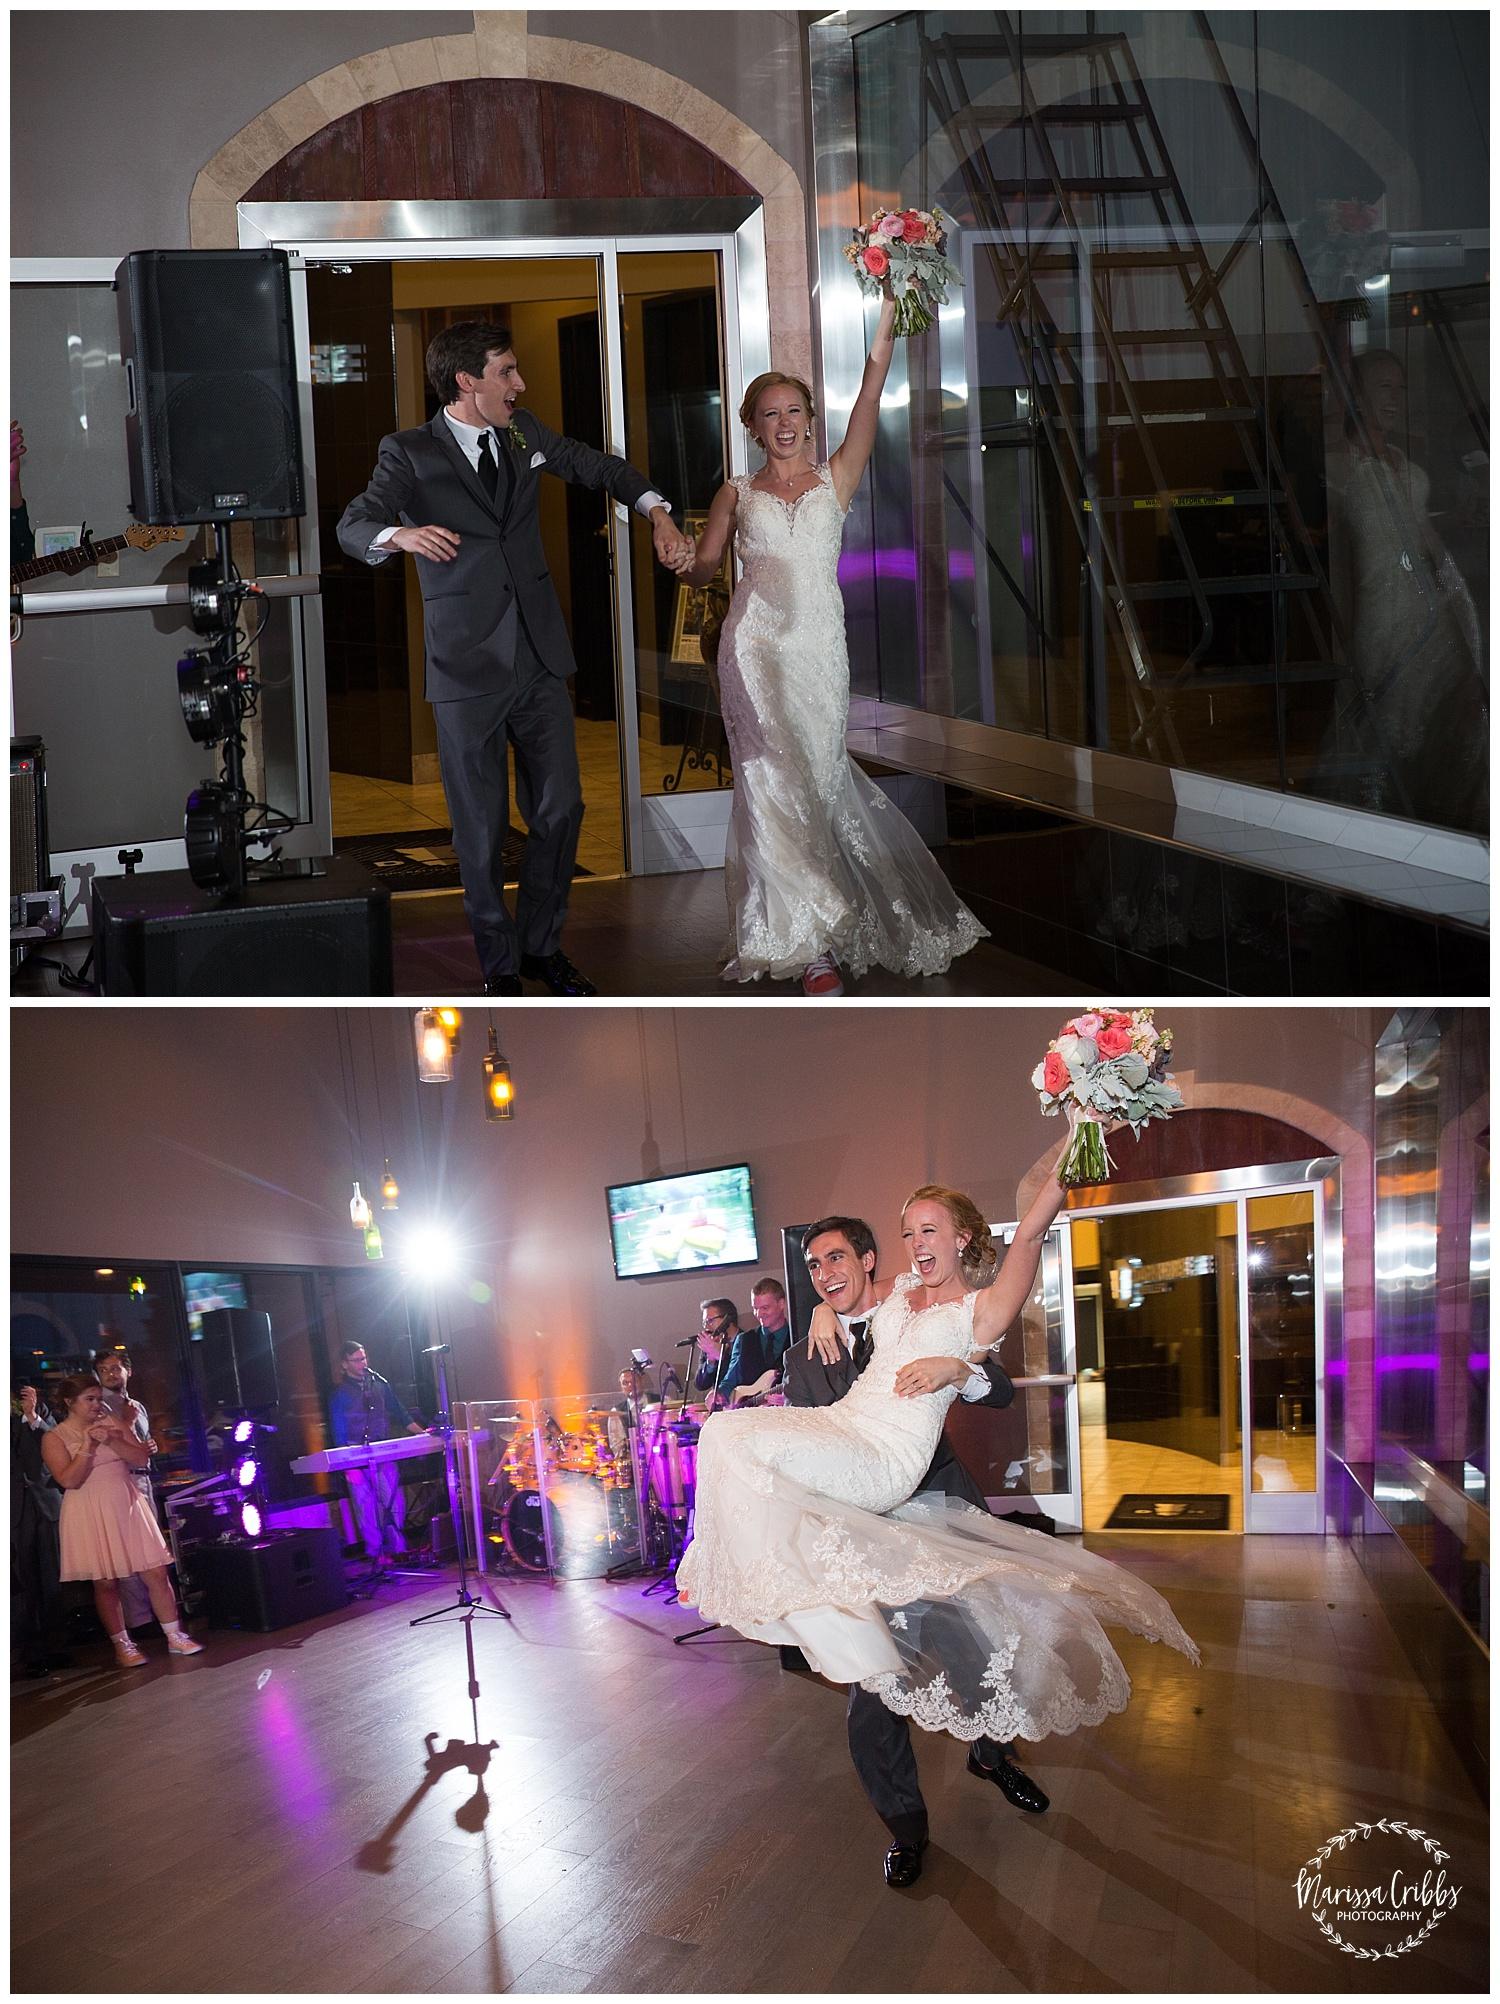 Twin Double Wedding | Union Horse Distilling Co. | Marissa Cribbs Photography | KC Weddings_0179.jpg